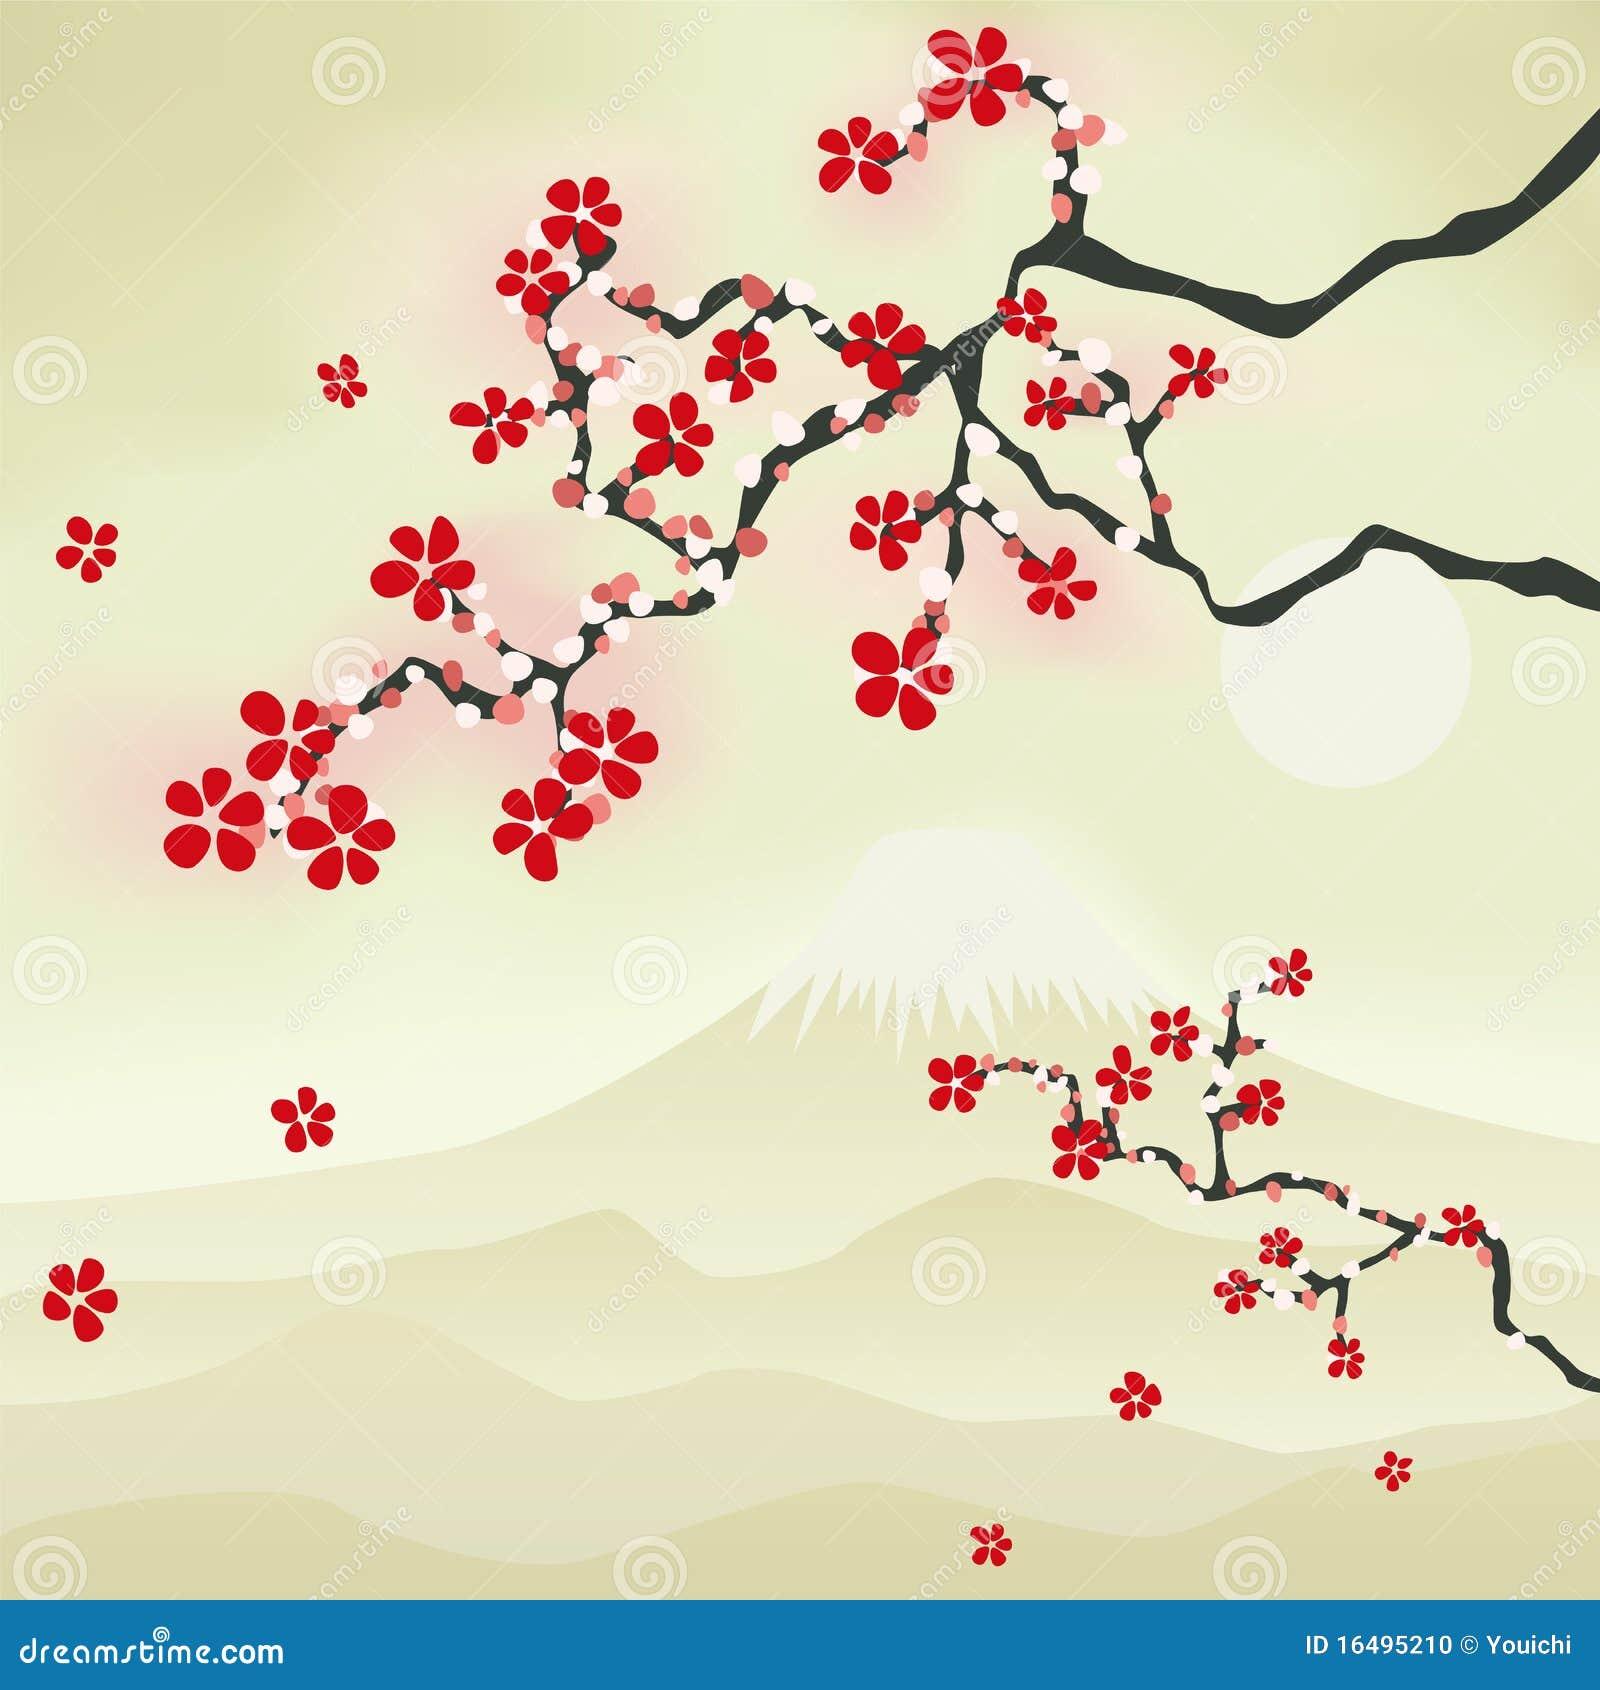 Japanische Kirschblute Vektor Abbildung Bild Von Exemplar Traditional Japanese Cherry Blossom Art